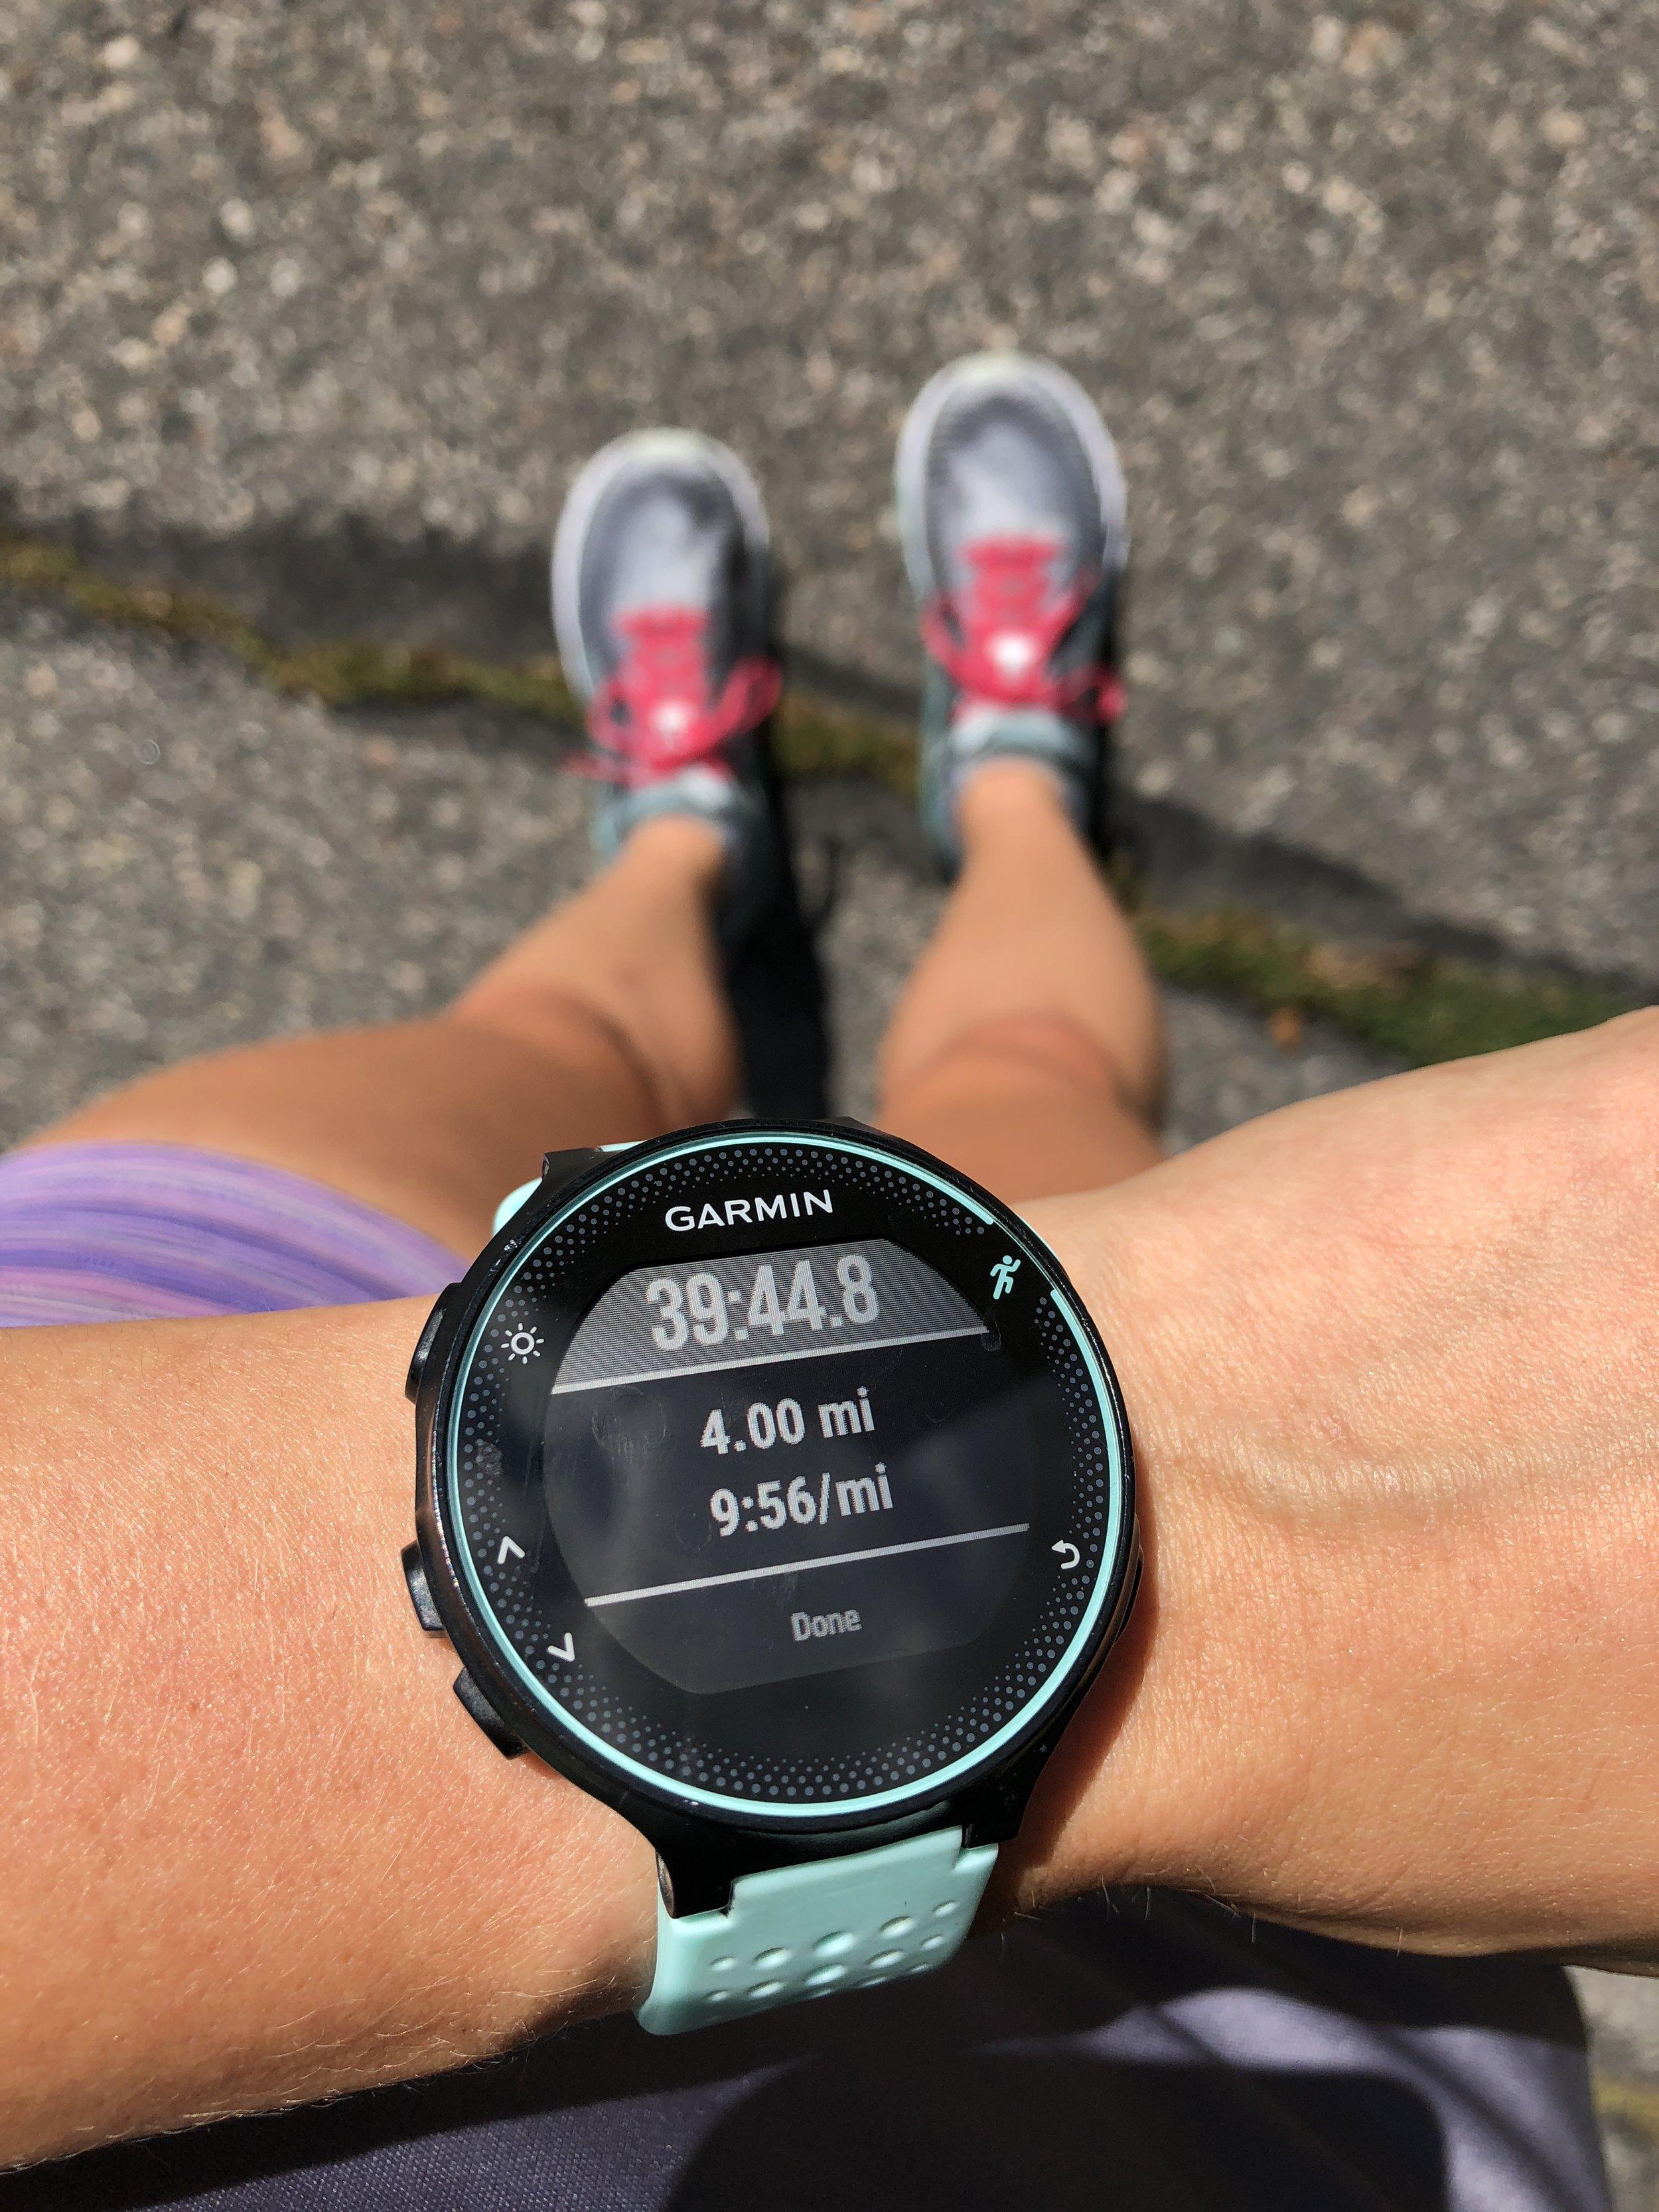 Felt like I was running an 8:00 min/mile. ha.